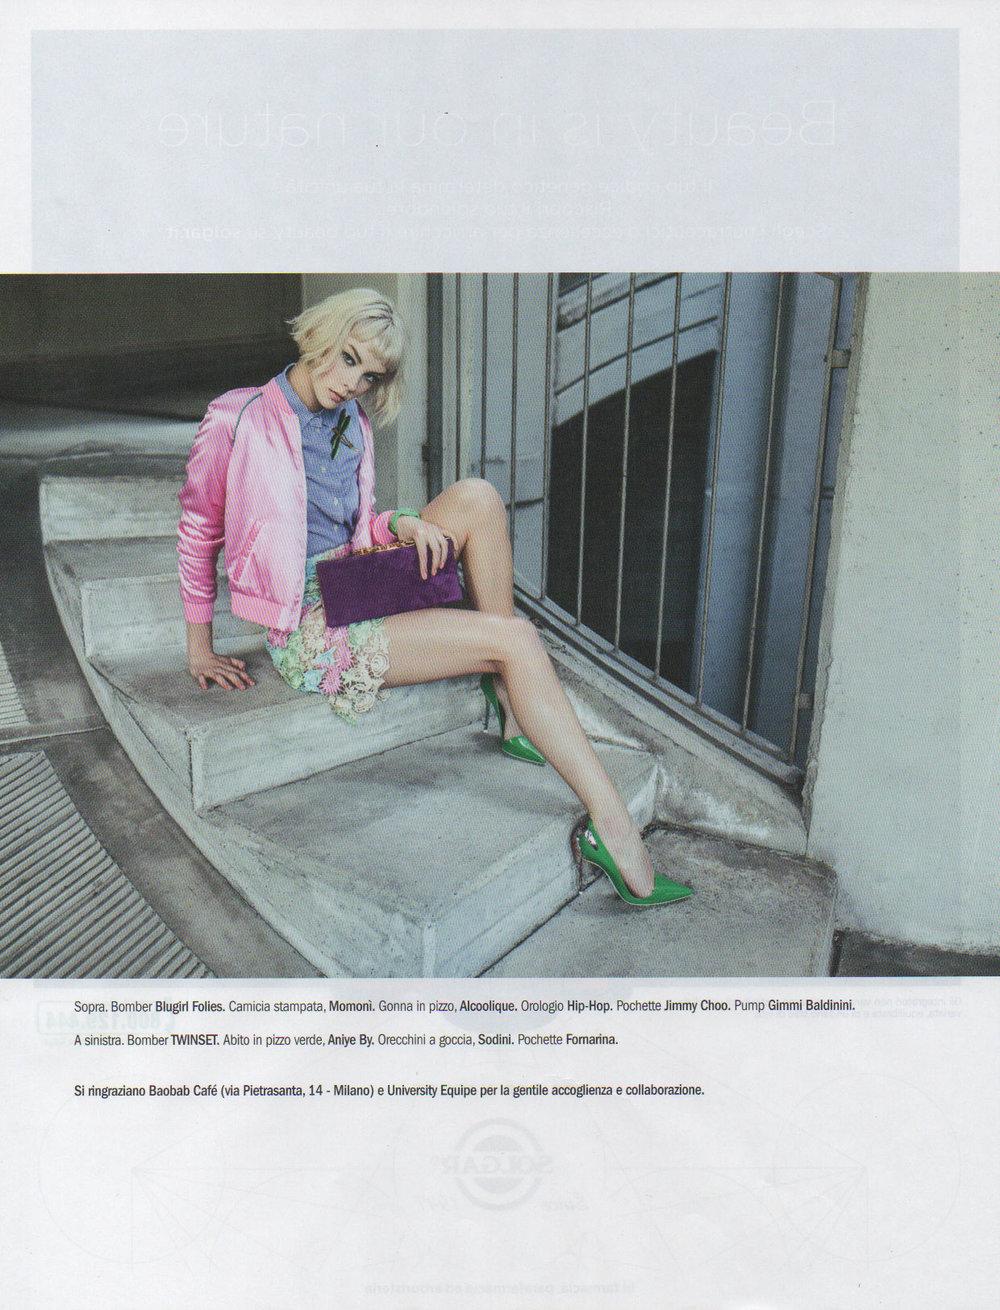 cosmopolitan07.jpg